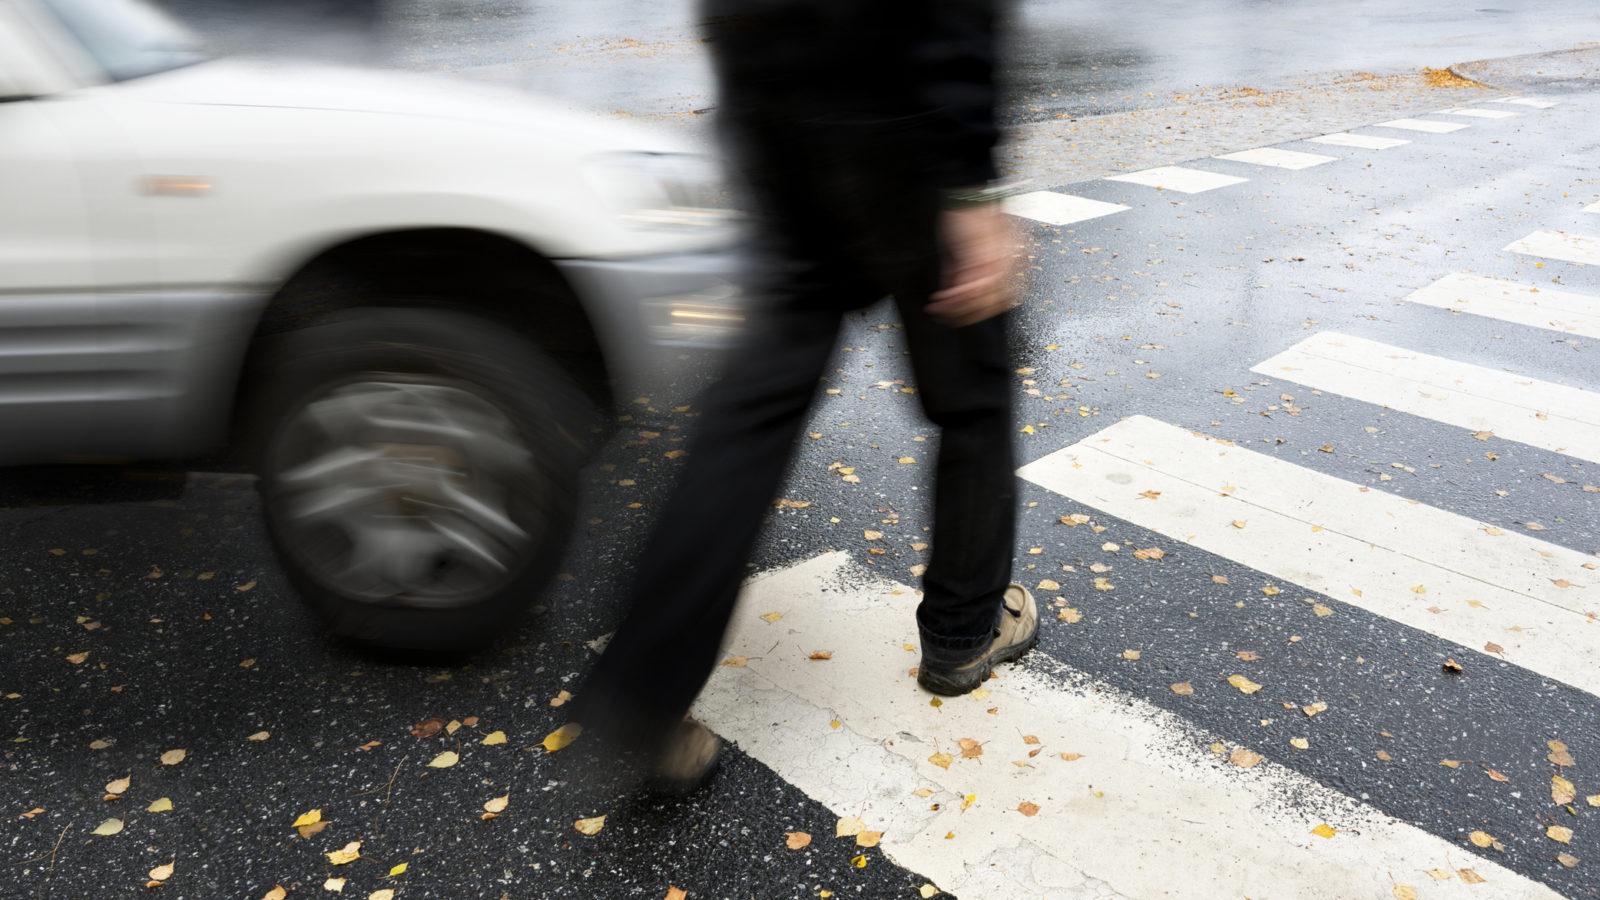 Man on pedestrian crossing in autumn